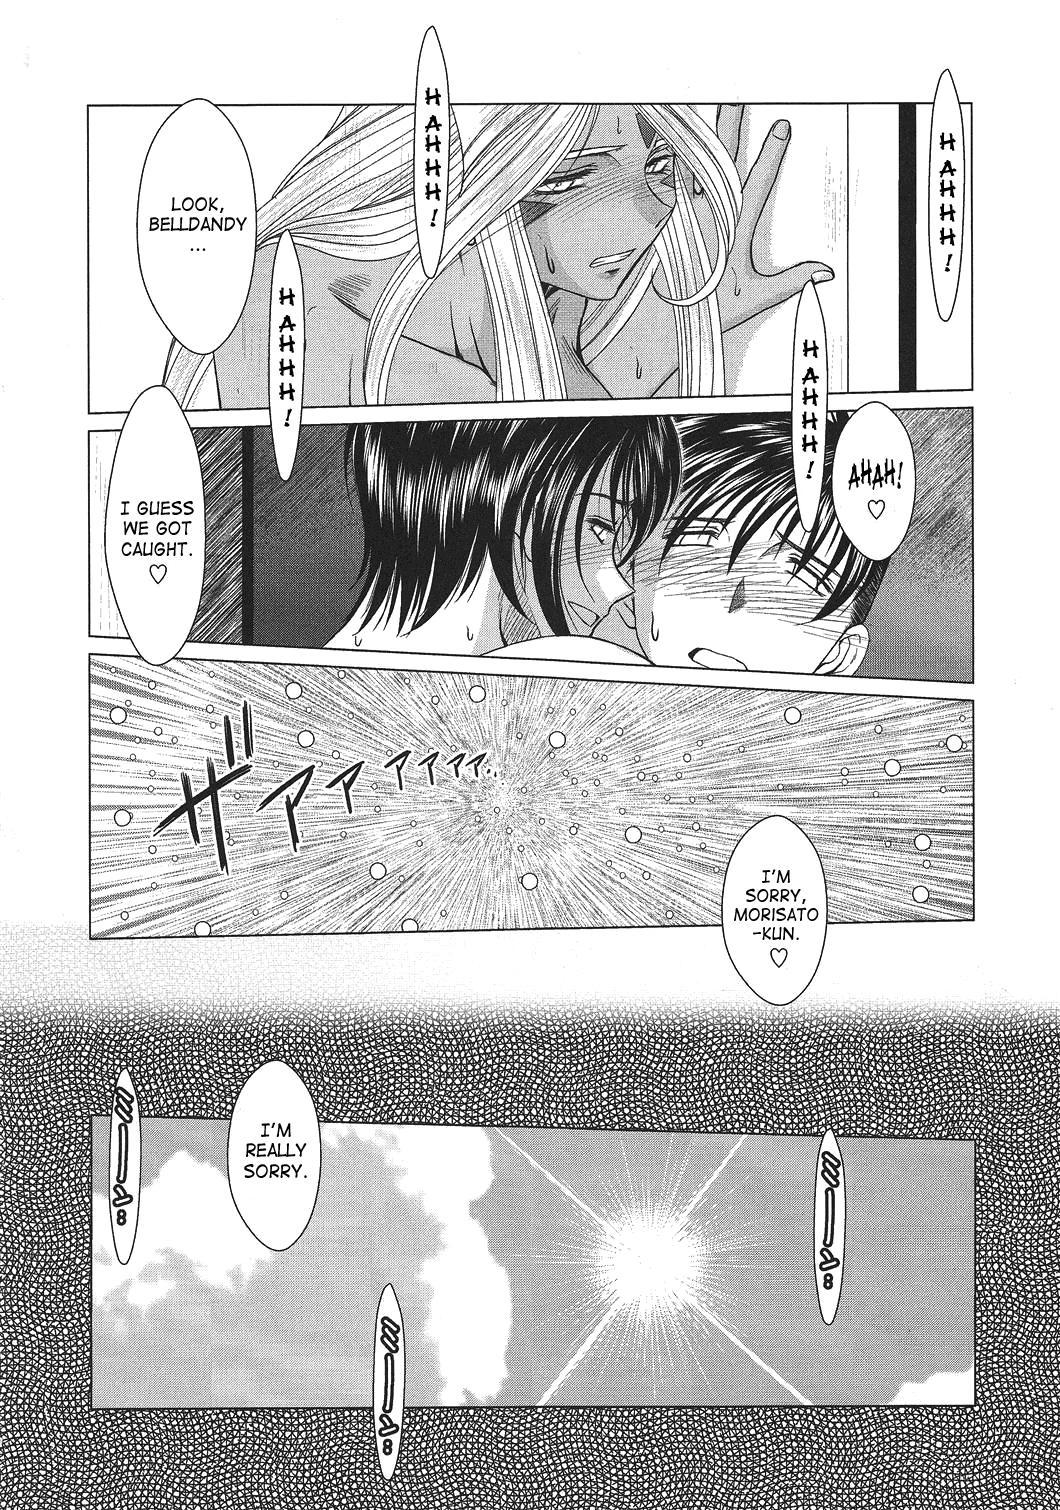 (C63) [CIRCLE OUTERWORLD (Chiba Shuusaku)] Midgard  (Ah! My Goddess) complete [eng] 527